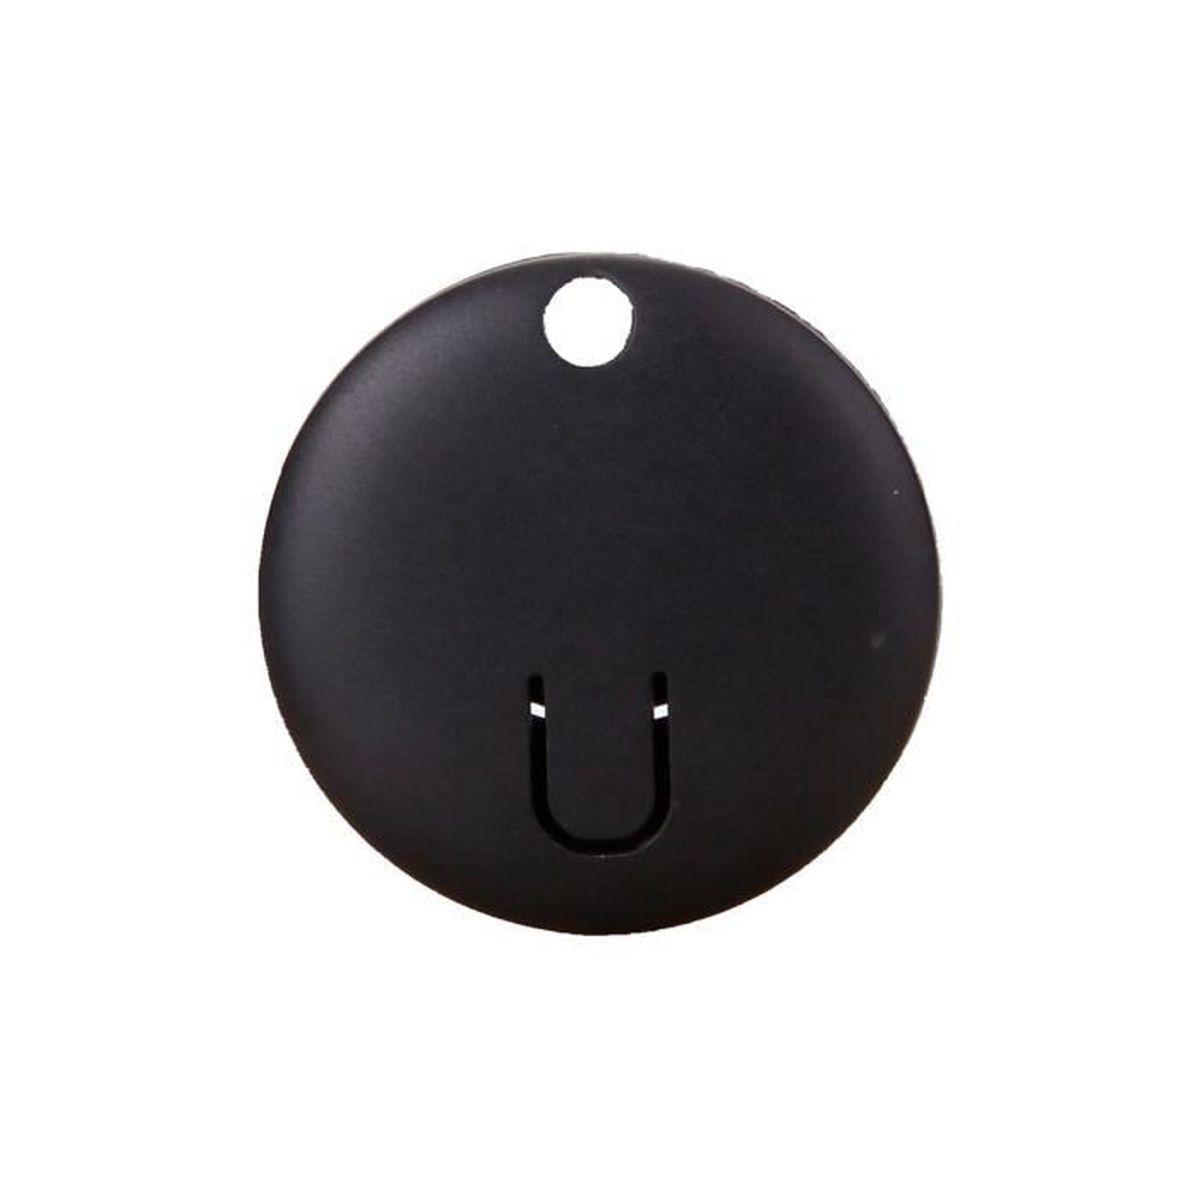 porte cl s bluetooth achat vente porte cl s 3664050080305 cdiscount. Black Bedroom Furniture Sets. Home Design Ideas